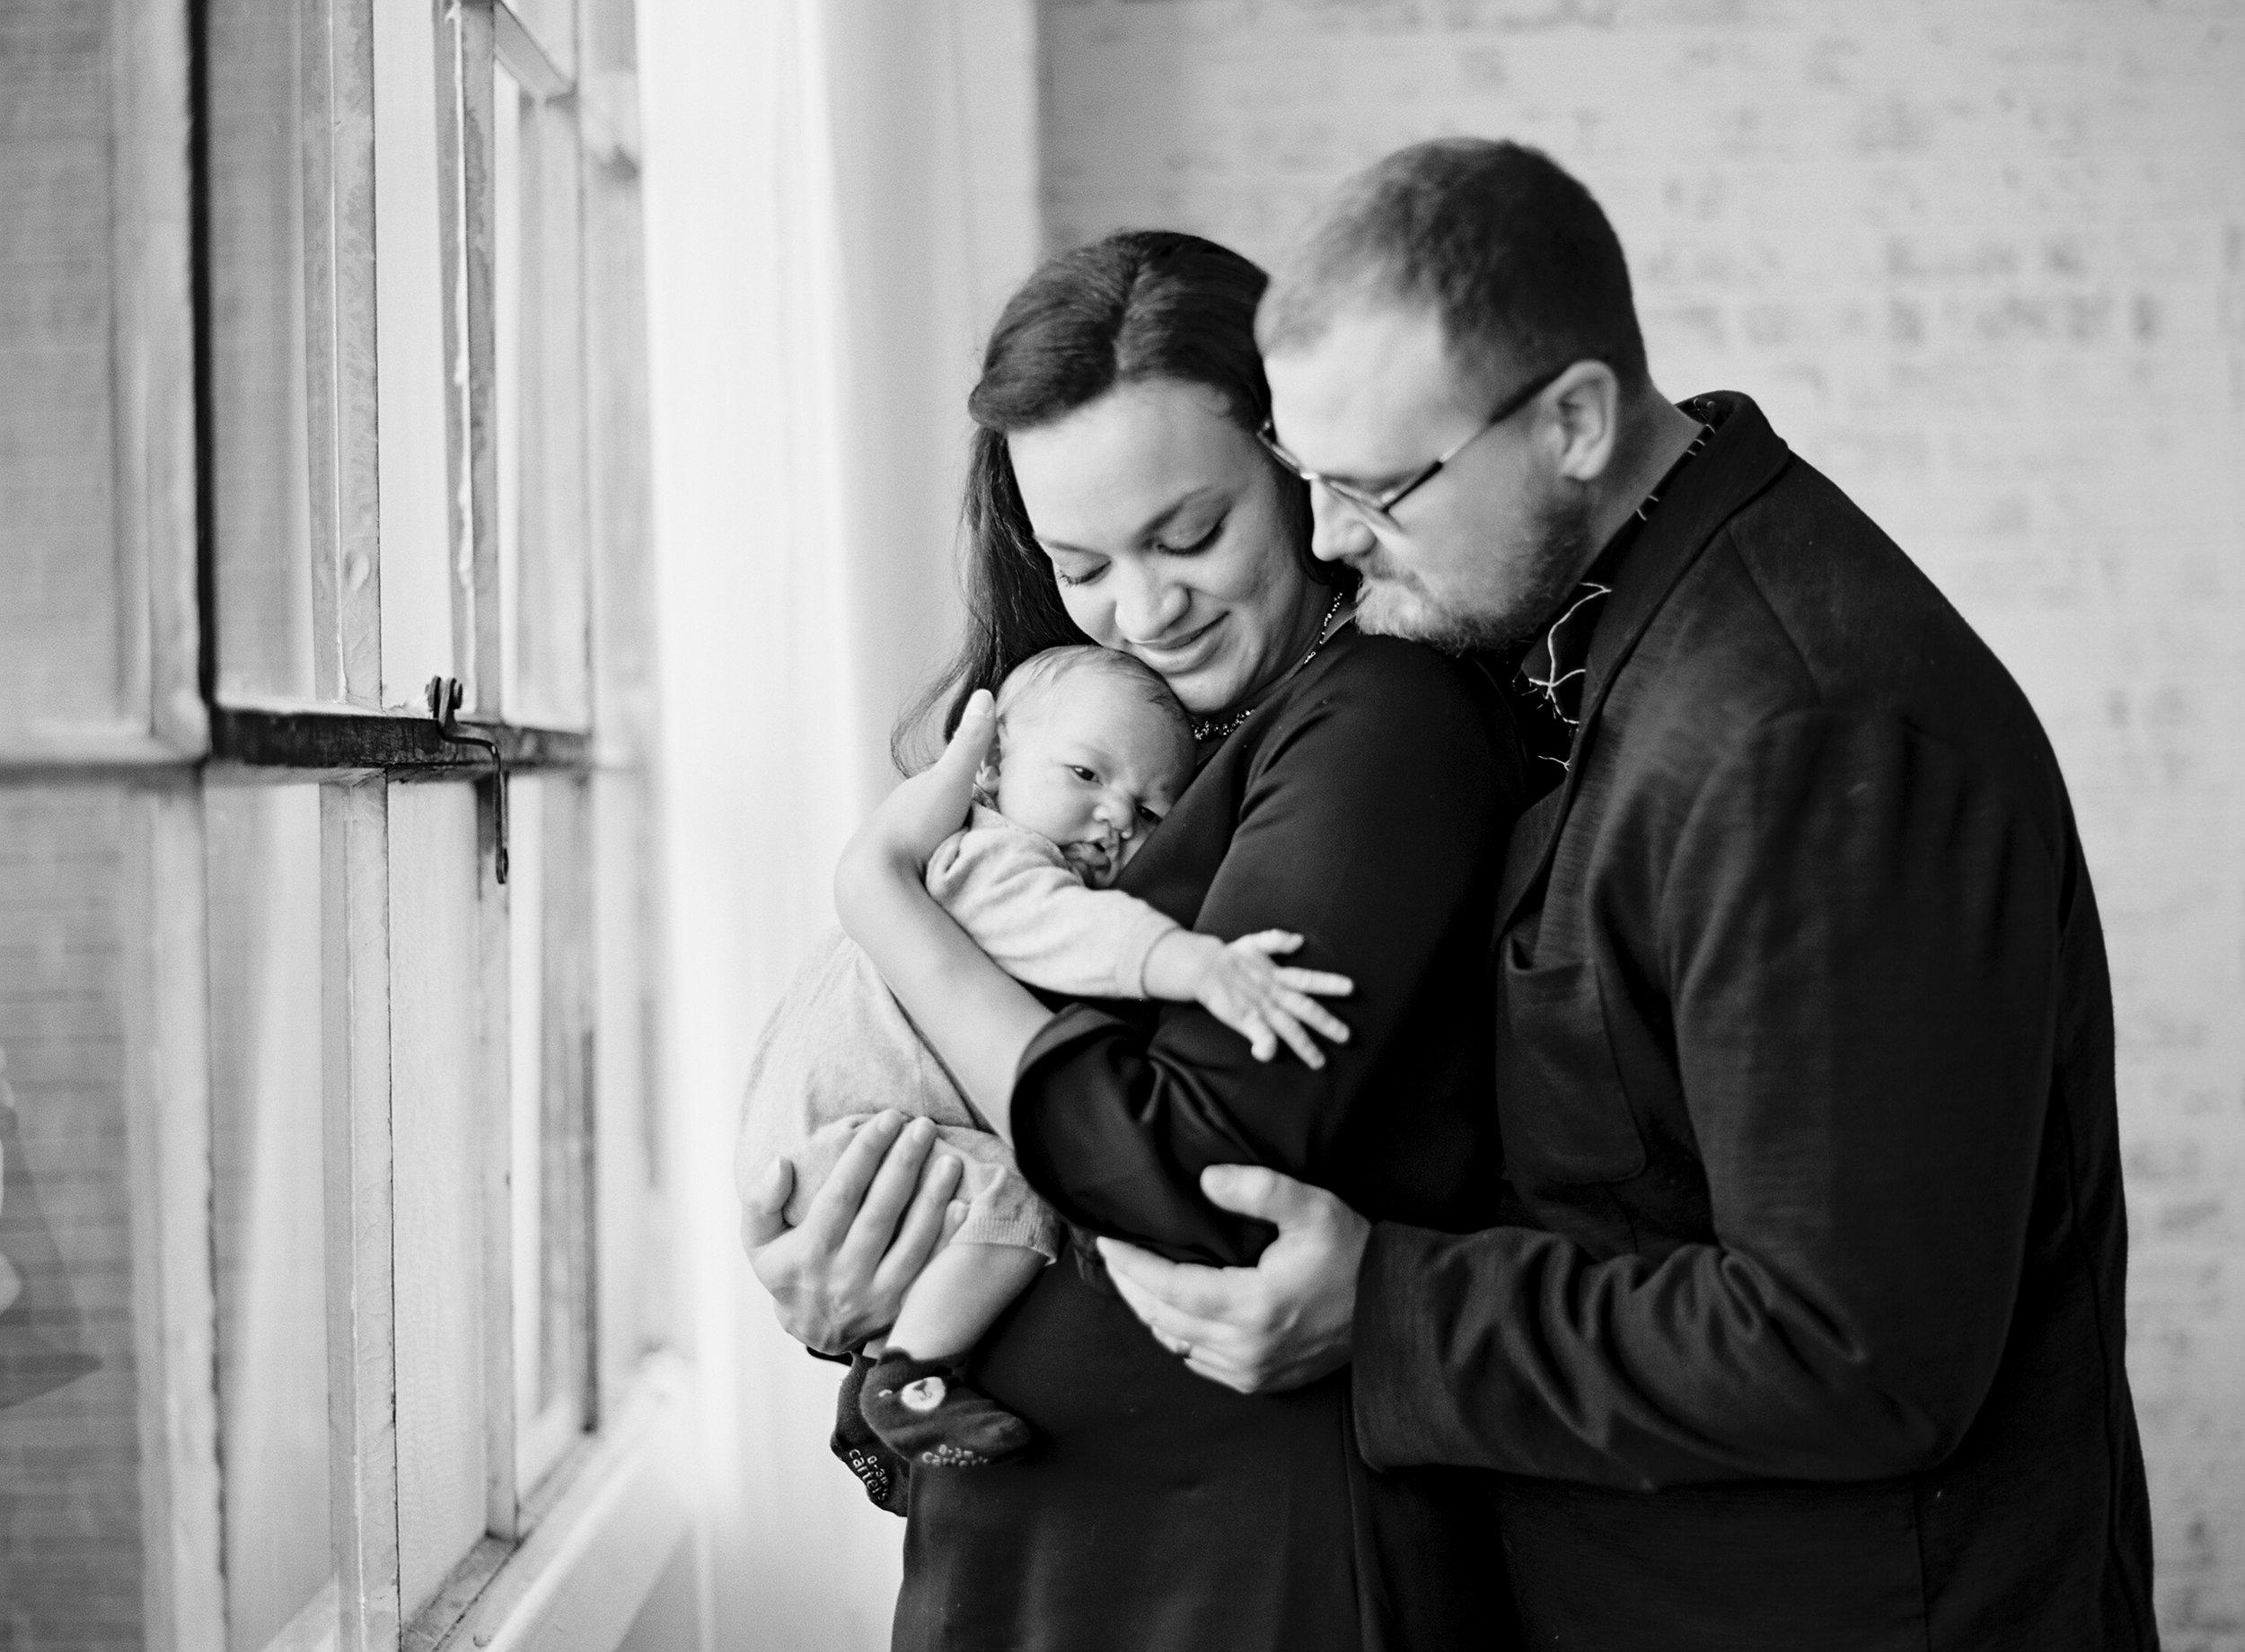 pittsburgh-newborn-family-photographer-Steven-Dray-family-anna-laero-photography-6.jpg